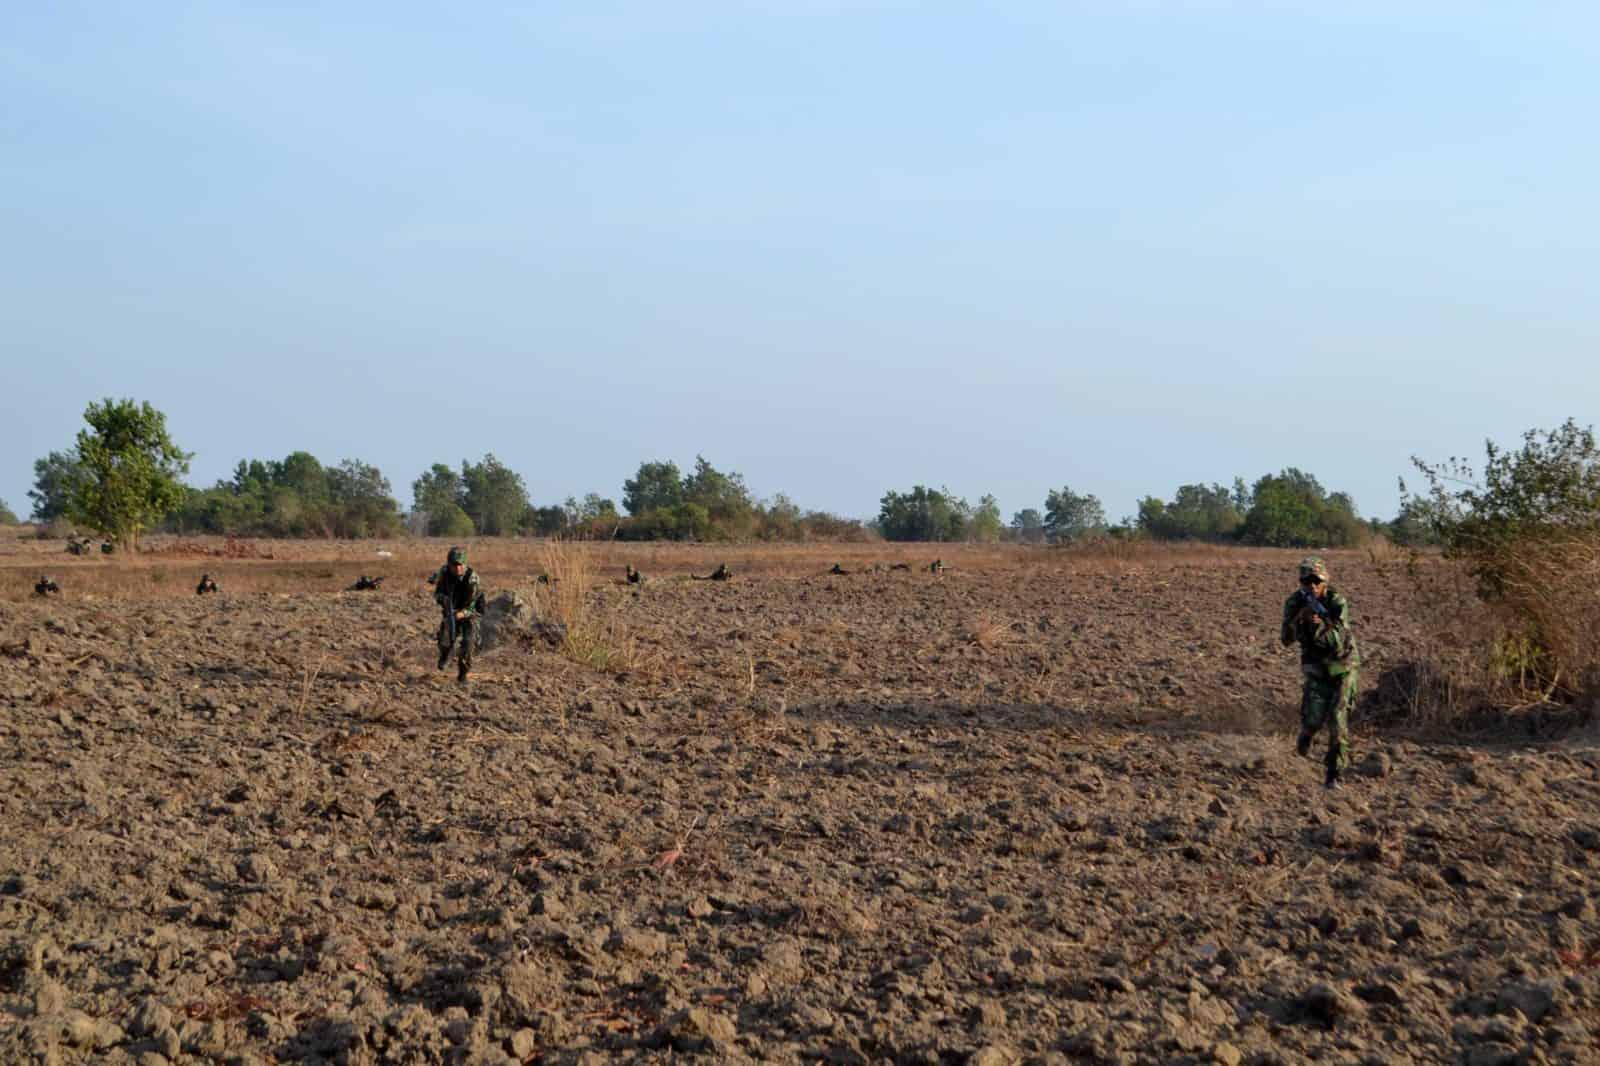 Latihan Hanlan dan Menembak di AWR Maluka Baulin Lanud Sjamsudin Noor